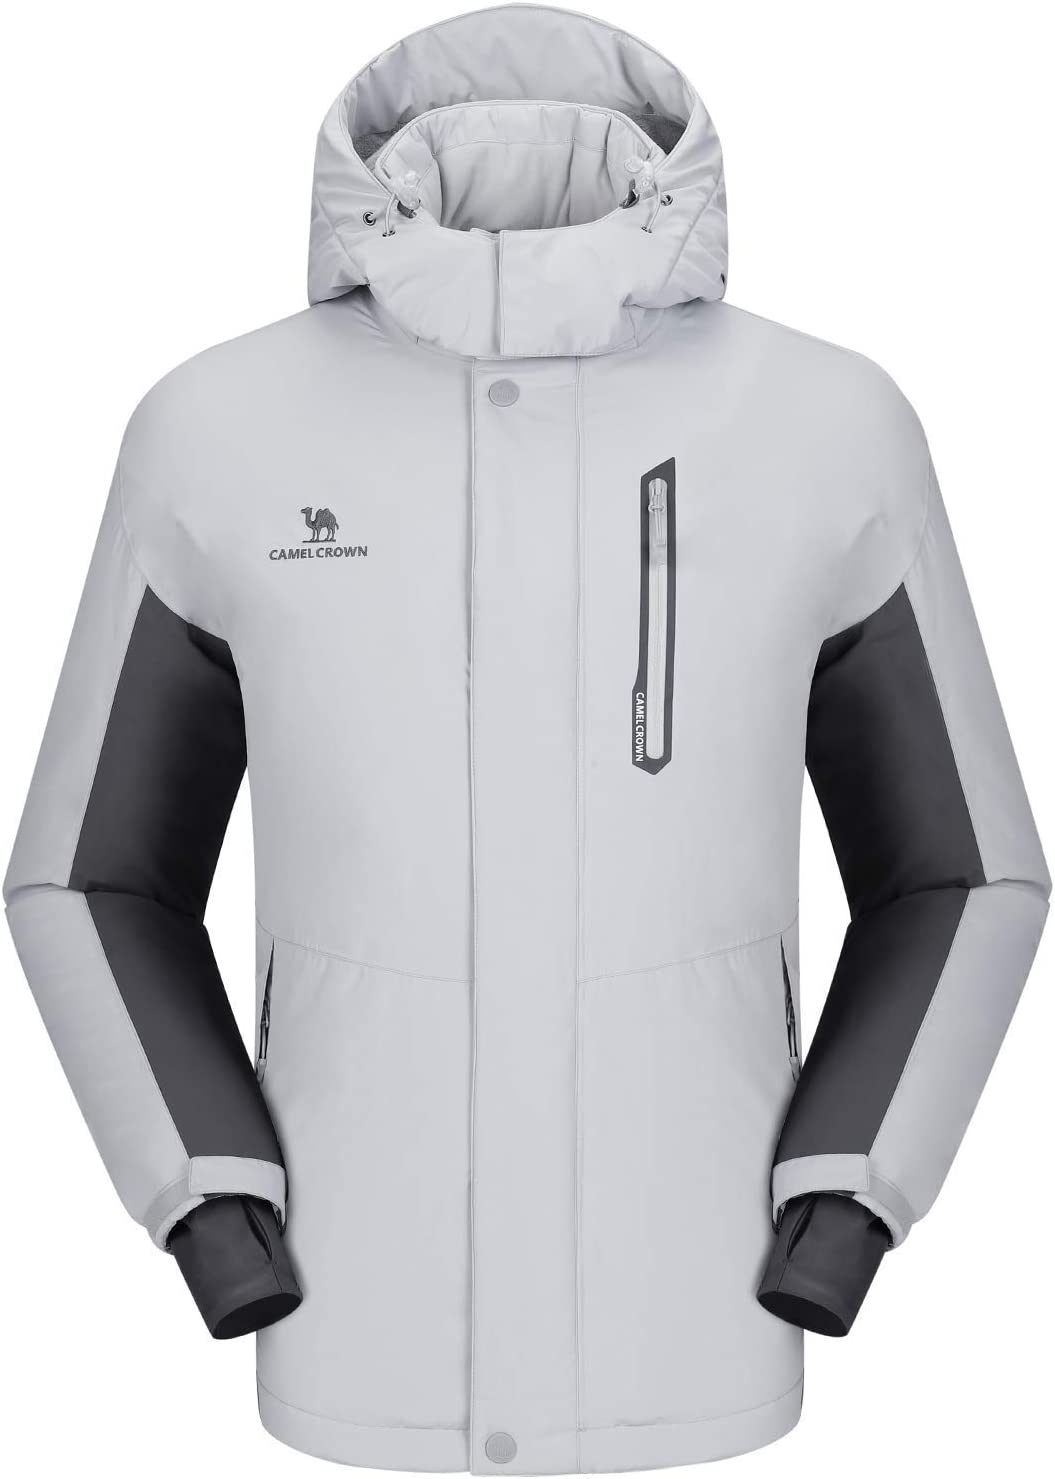 CAMEL CROWN Chaqueta Impermeable con Capucha para Hombre, A Prueba de Viento Chaqueta de Esquí con Forro Polar, Jacket Invierno para Montaña Cámping Viajes Snowboard Deportes Múltiples Bolsillos